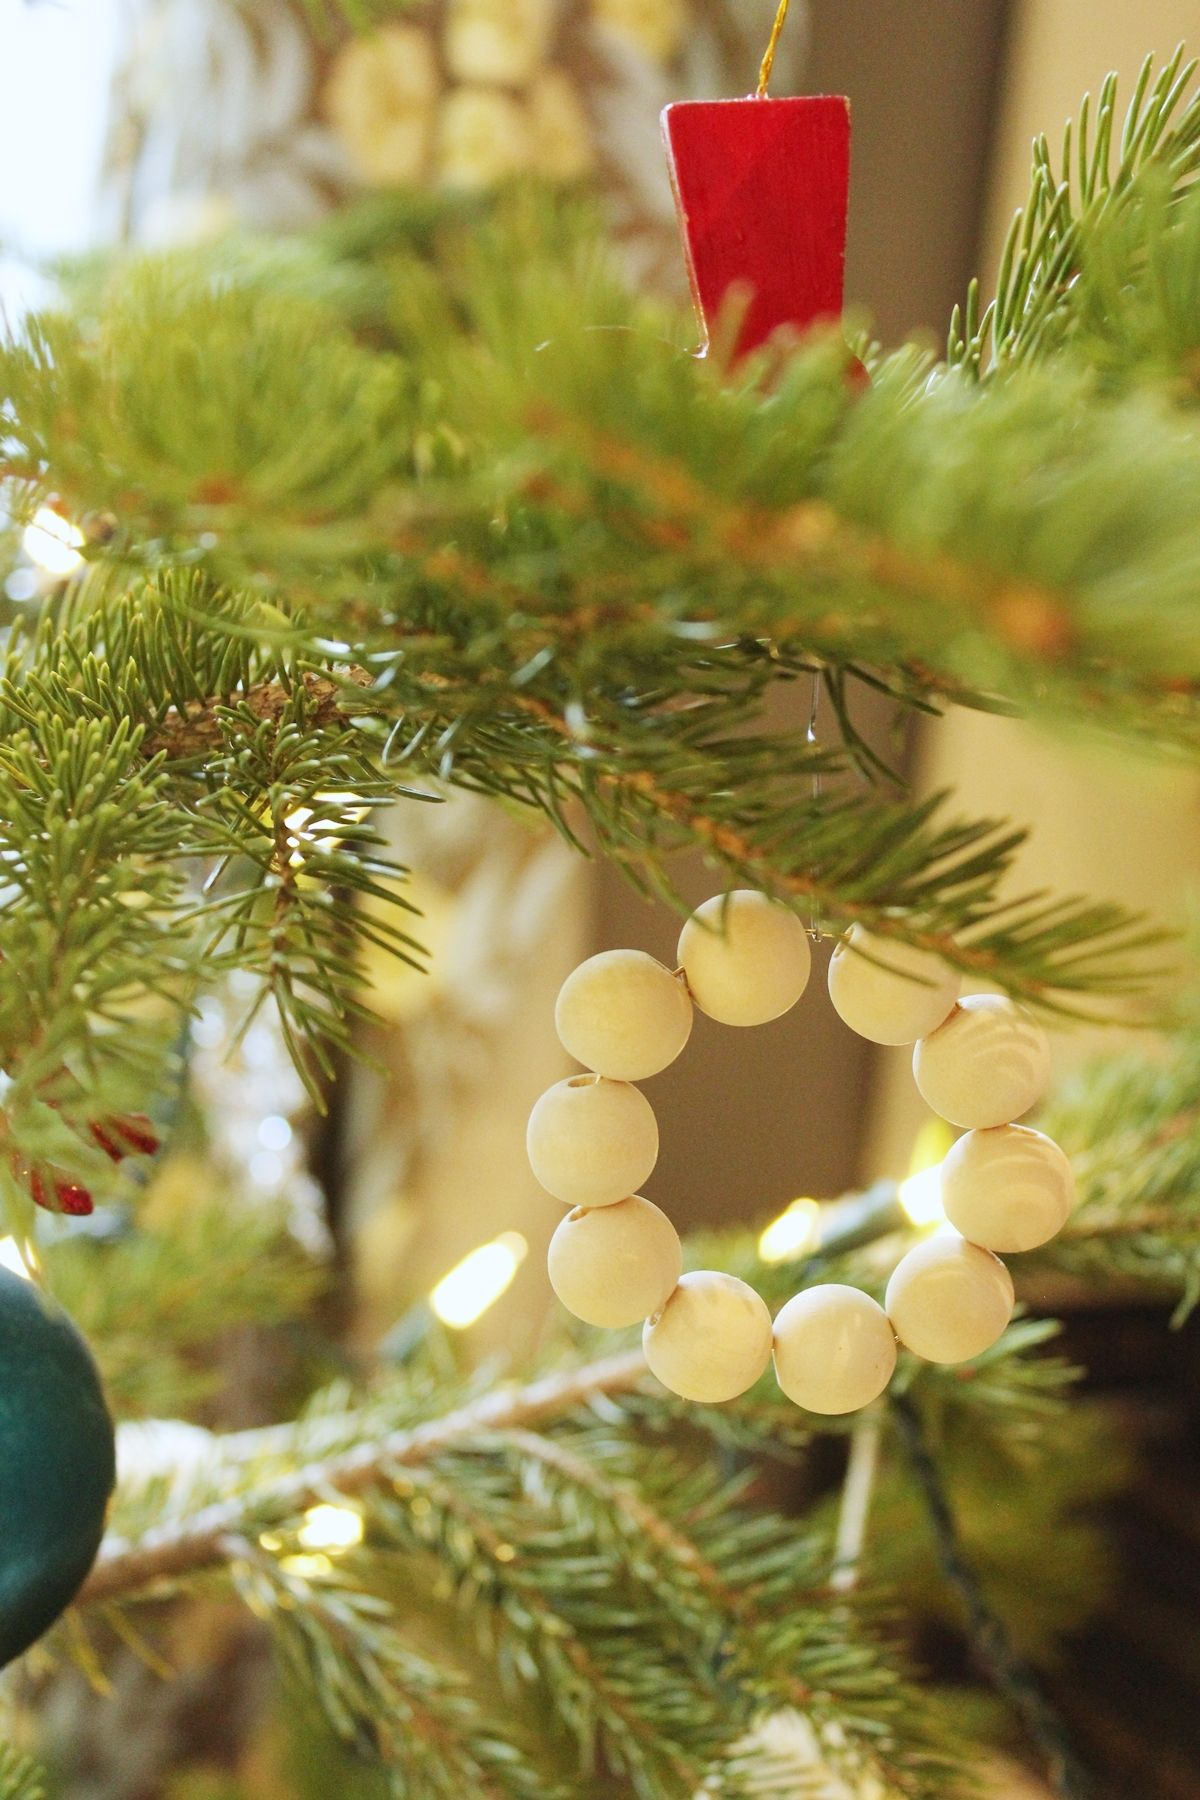 DIY Scandinavian Wooden Ornaments - mini wreath on tree